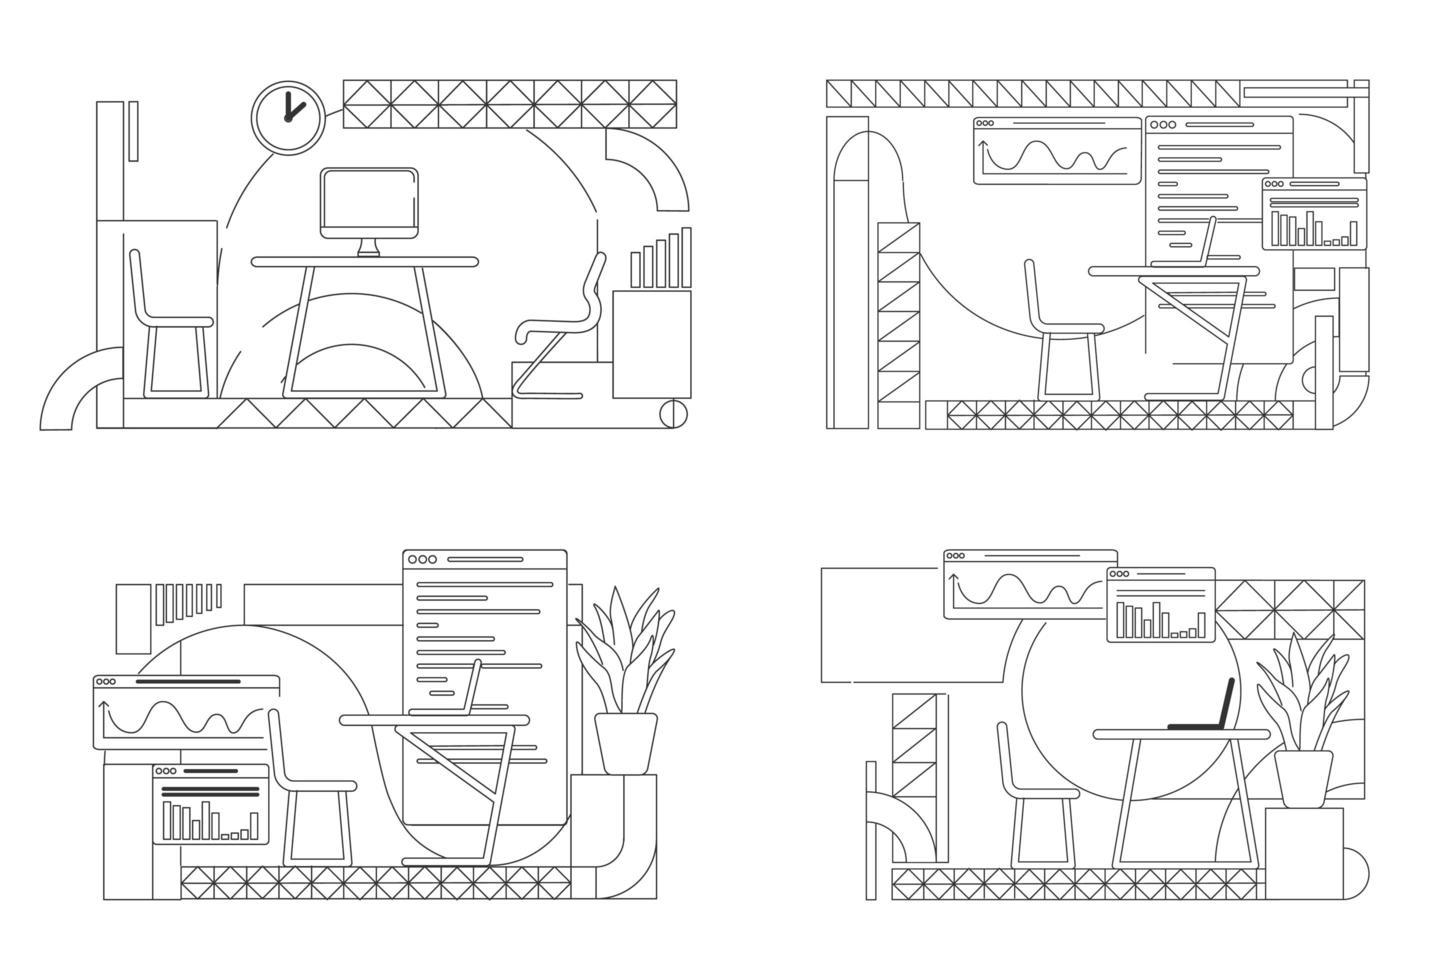 Büro Innenarchitektur Umriss Set vektor